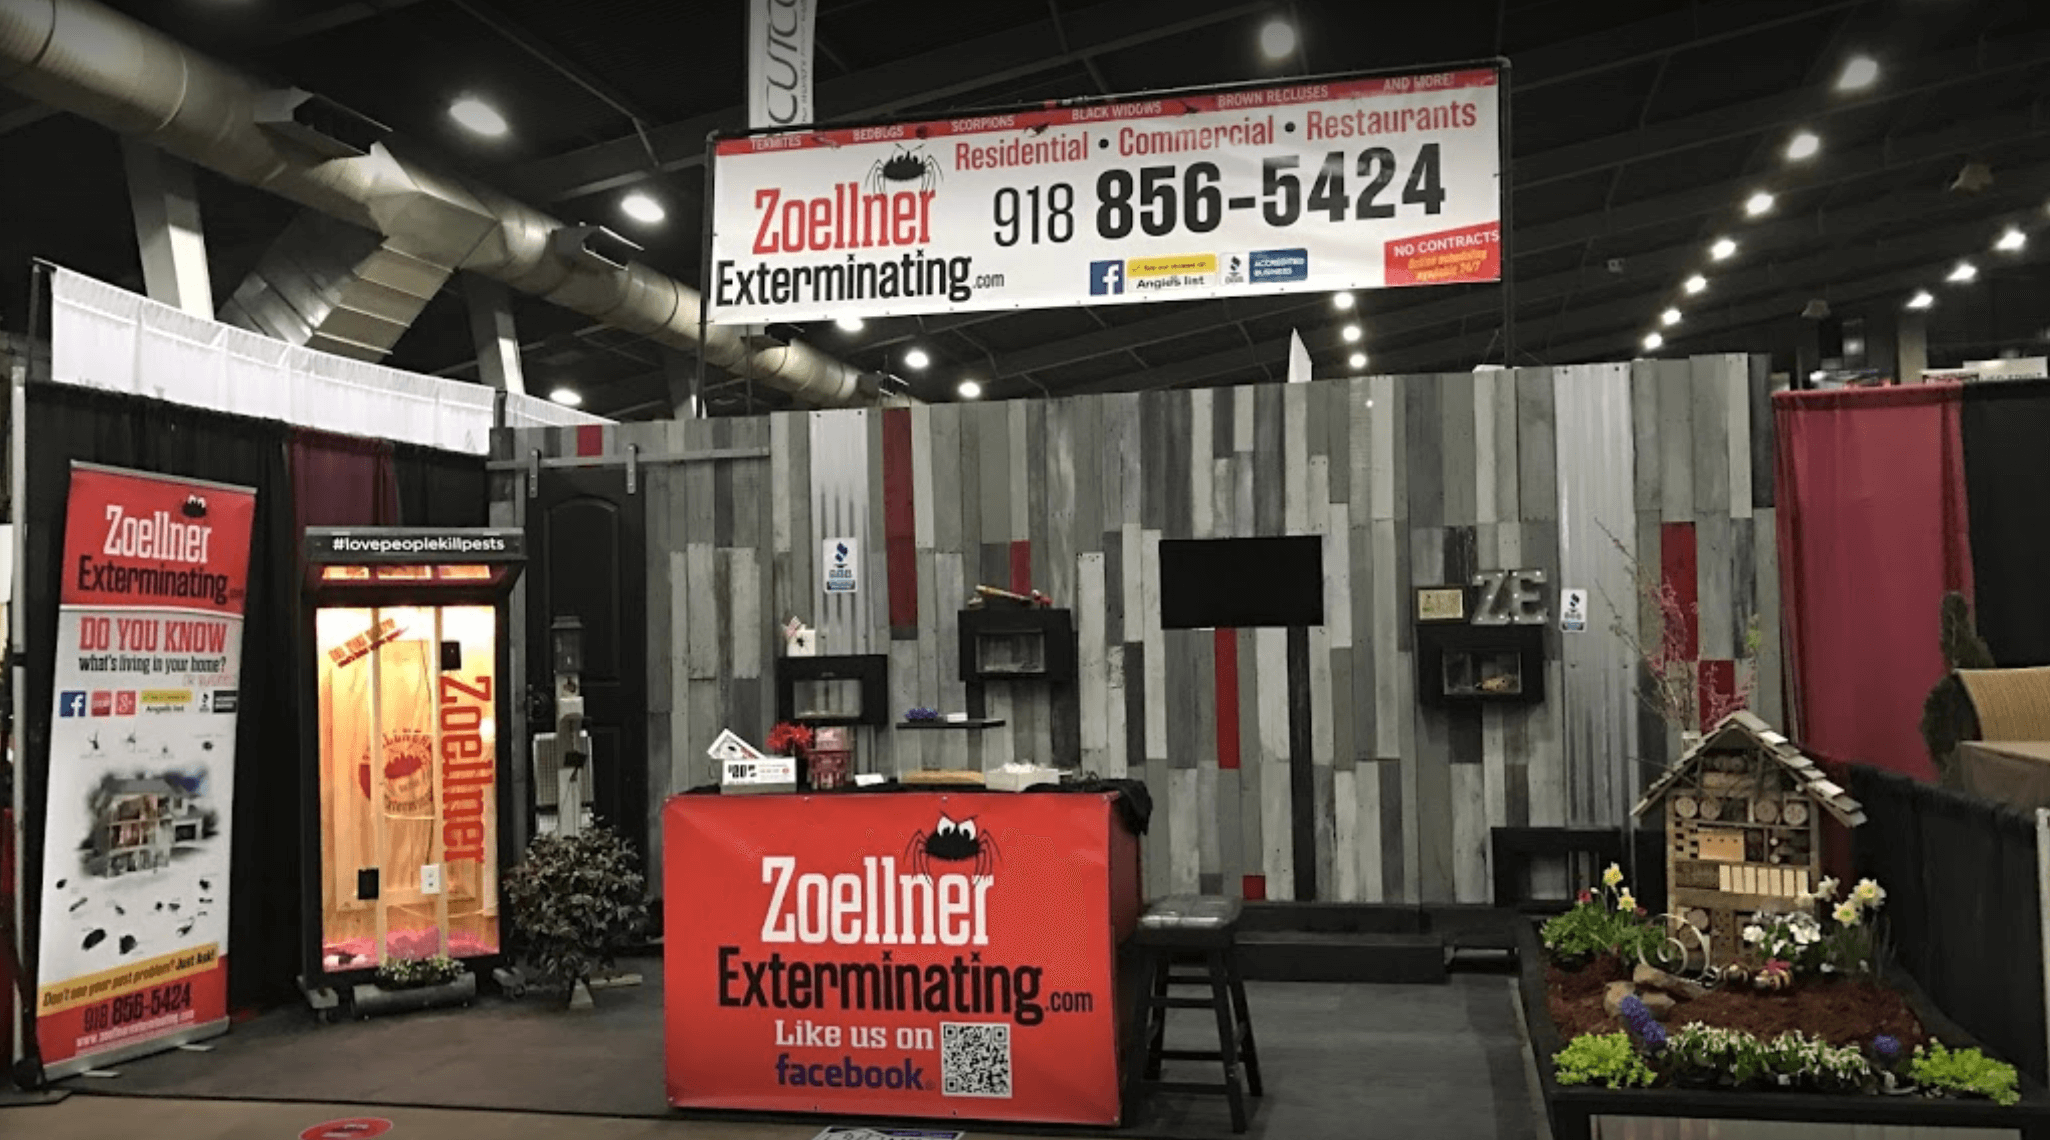 Zoellner Exterminating - Pest Control Success Story